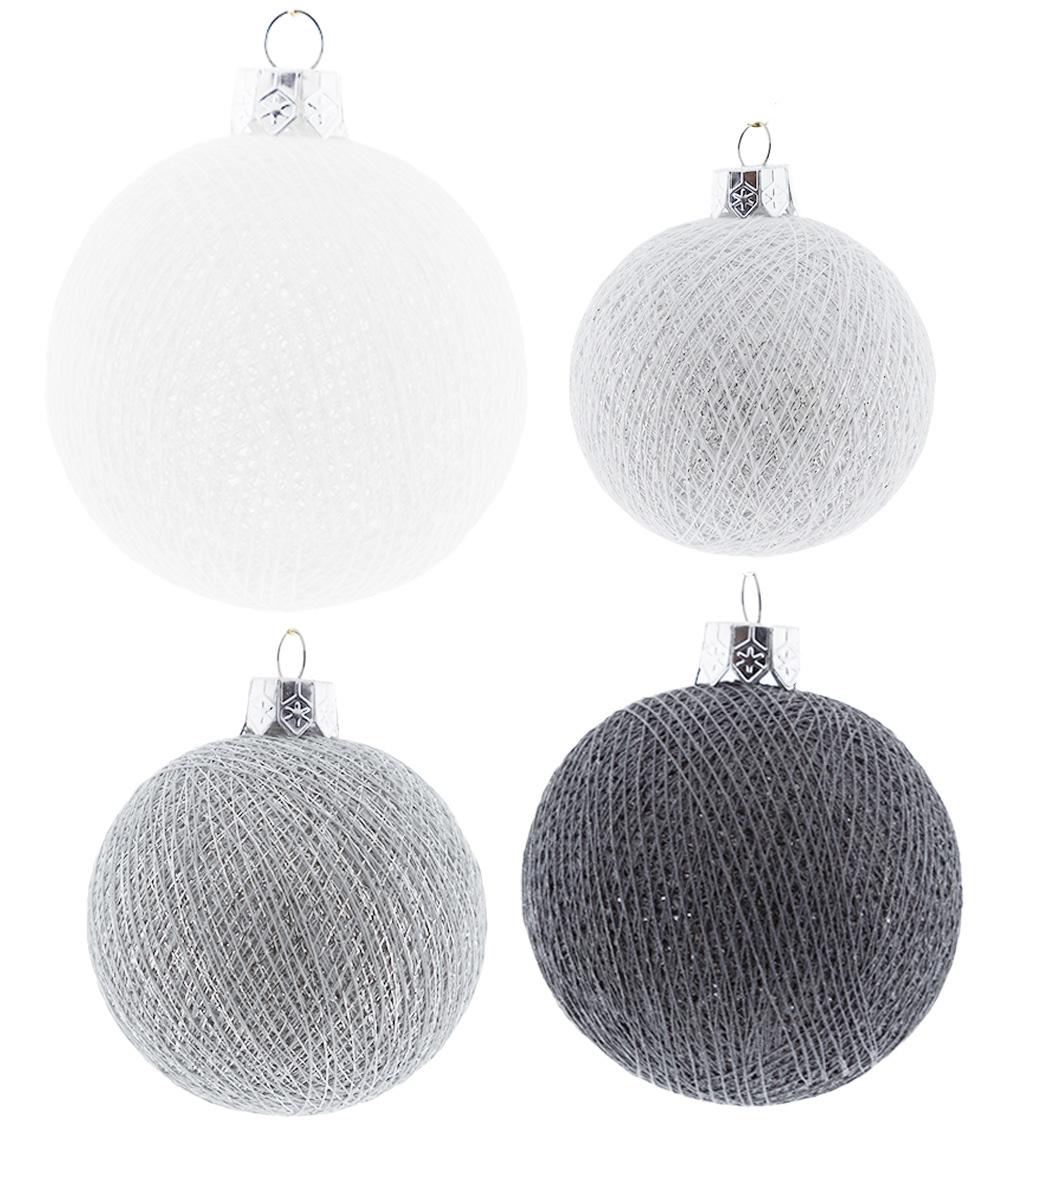 Kerstmis Cotton Balls - Silver Mix Premium